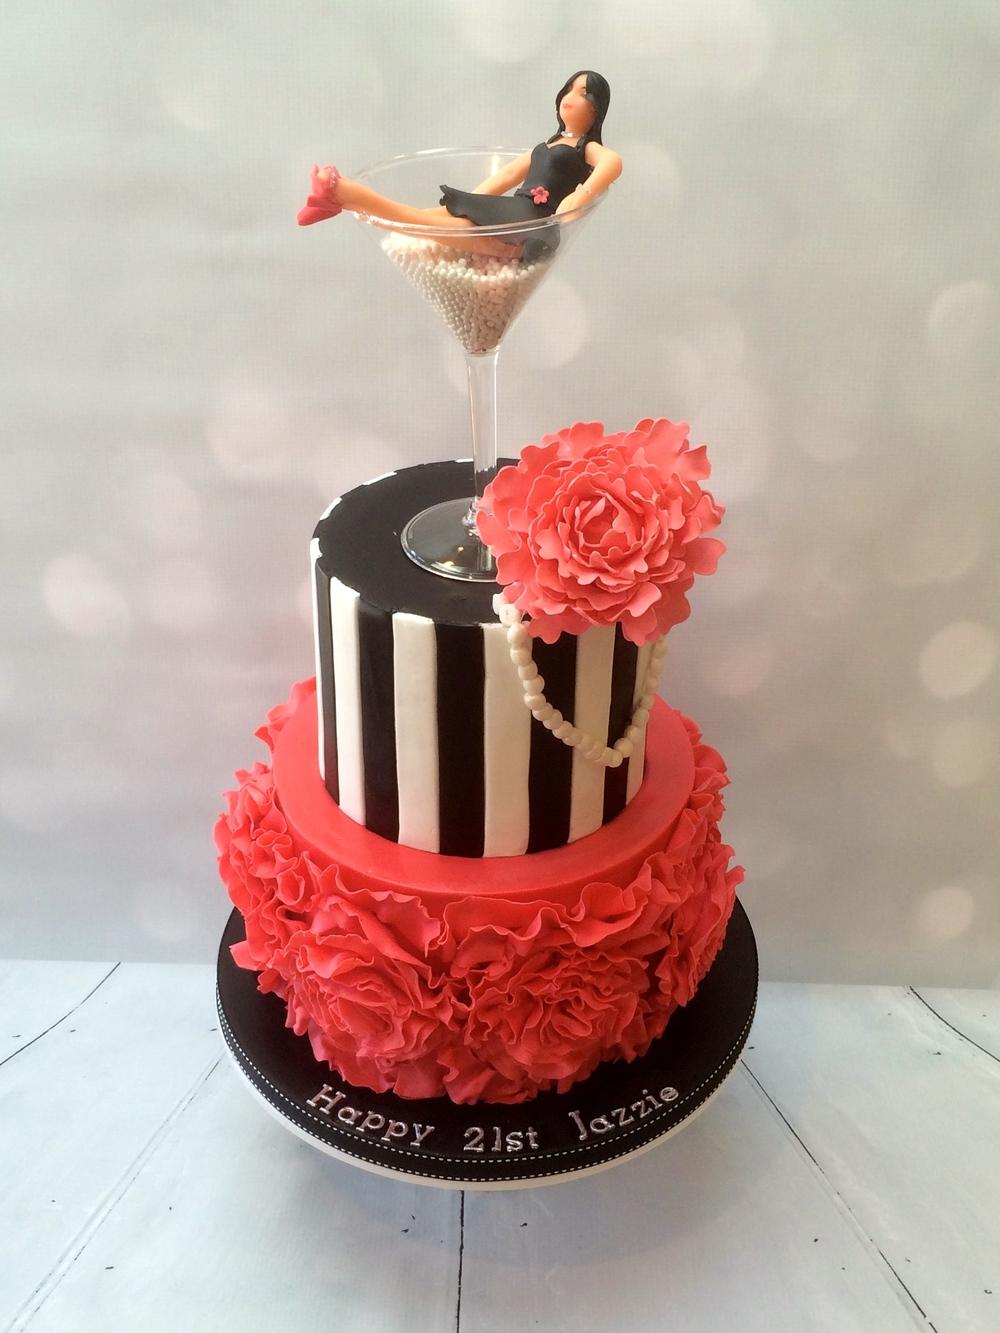 Peony & Pearls 21st Birthday Cake